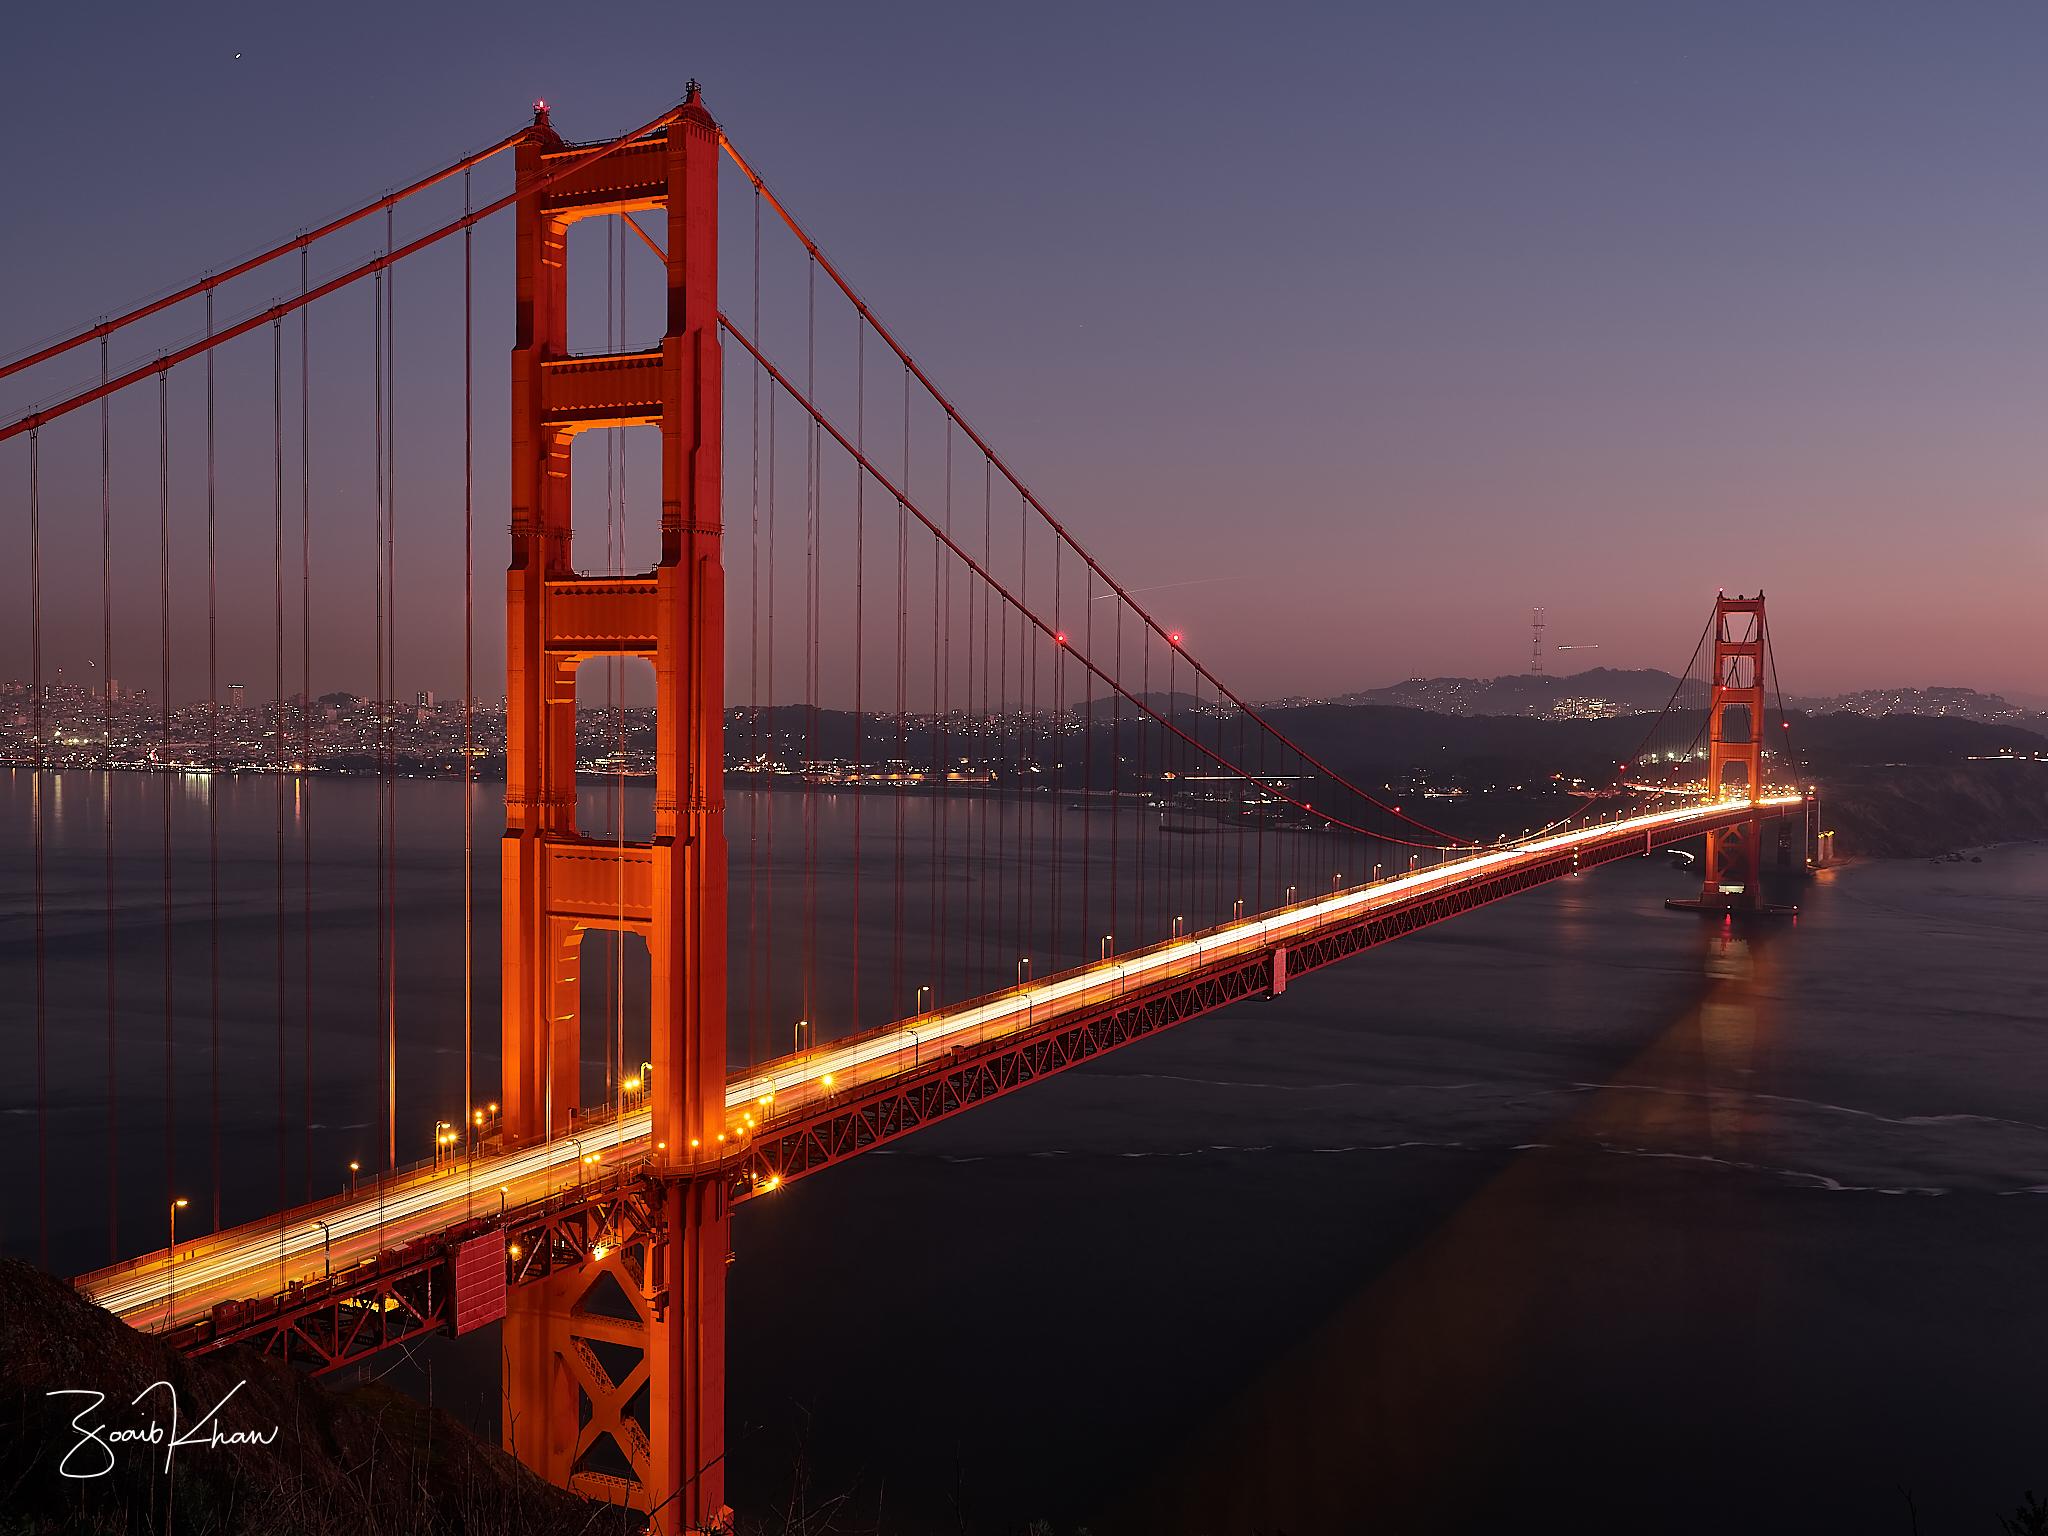 Sunset at Golden Gate Bridge, USA